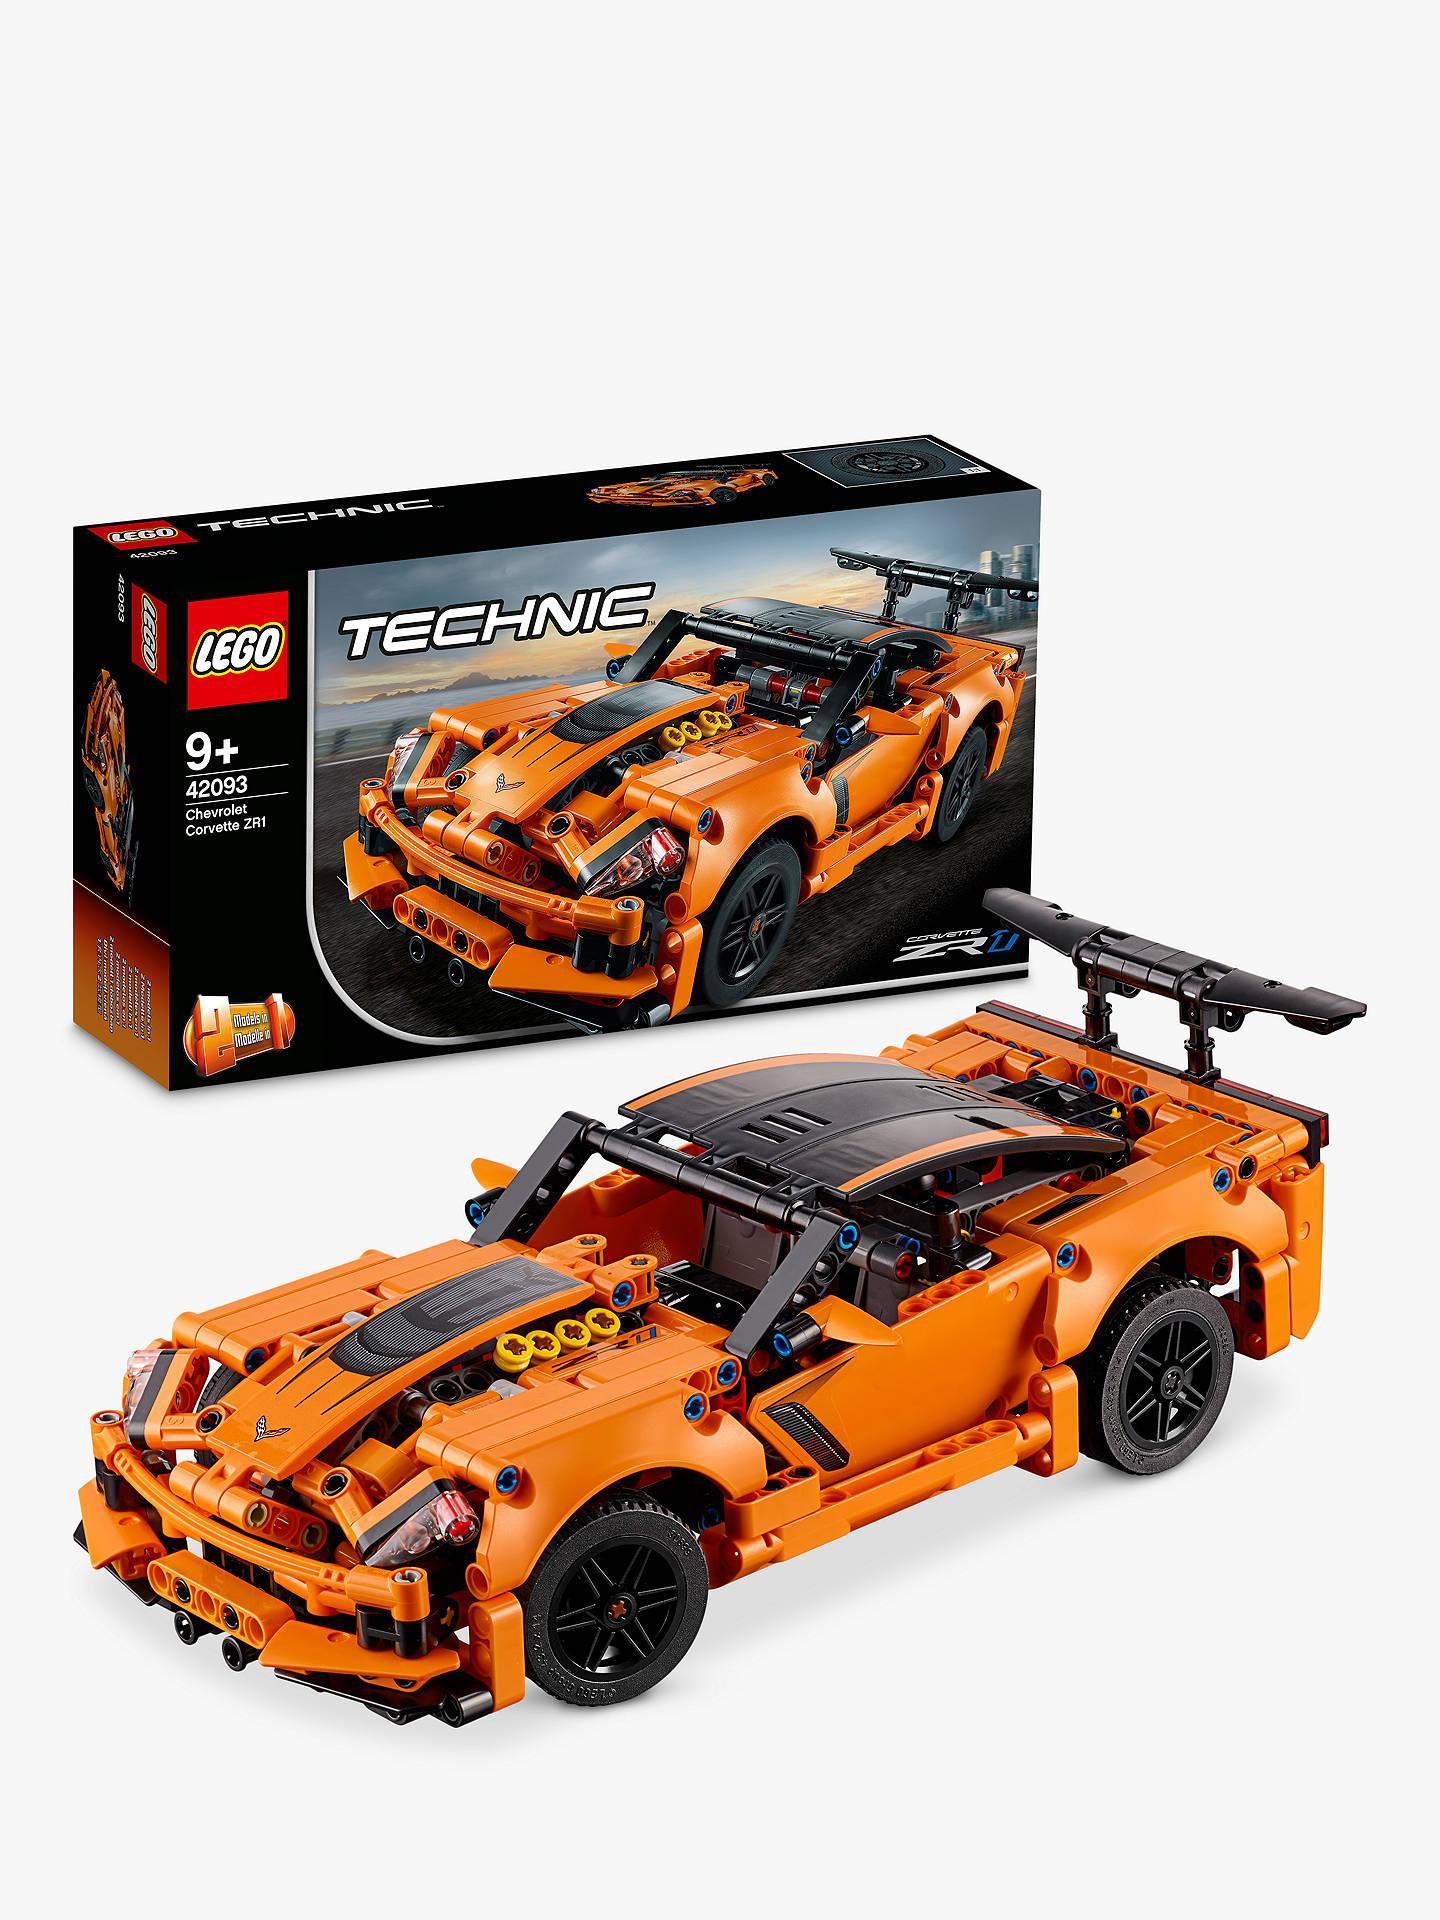 lego technic 42093 collectable car models 2in1 chevrolet corvette zr1 car